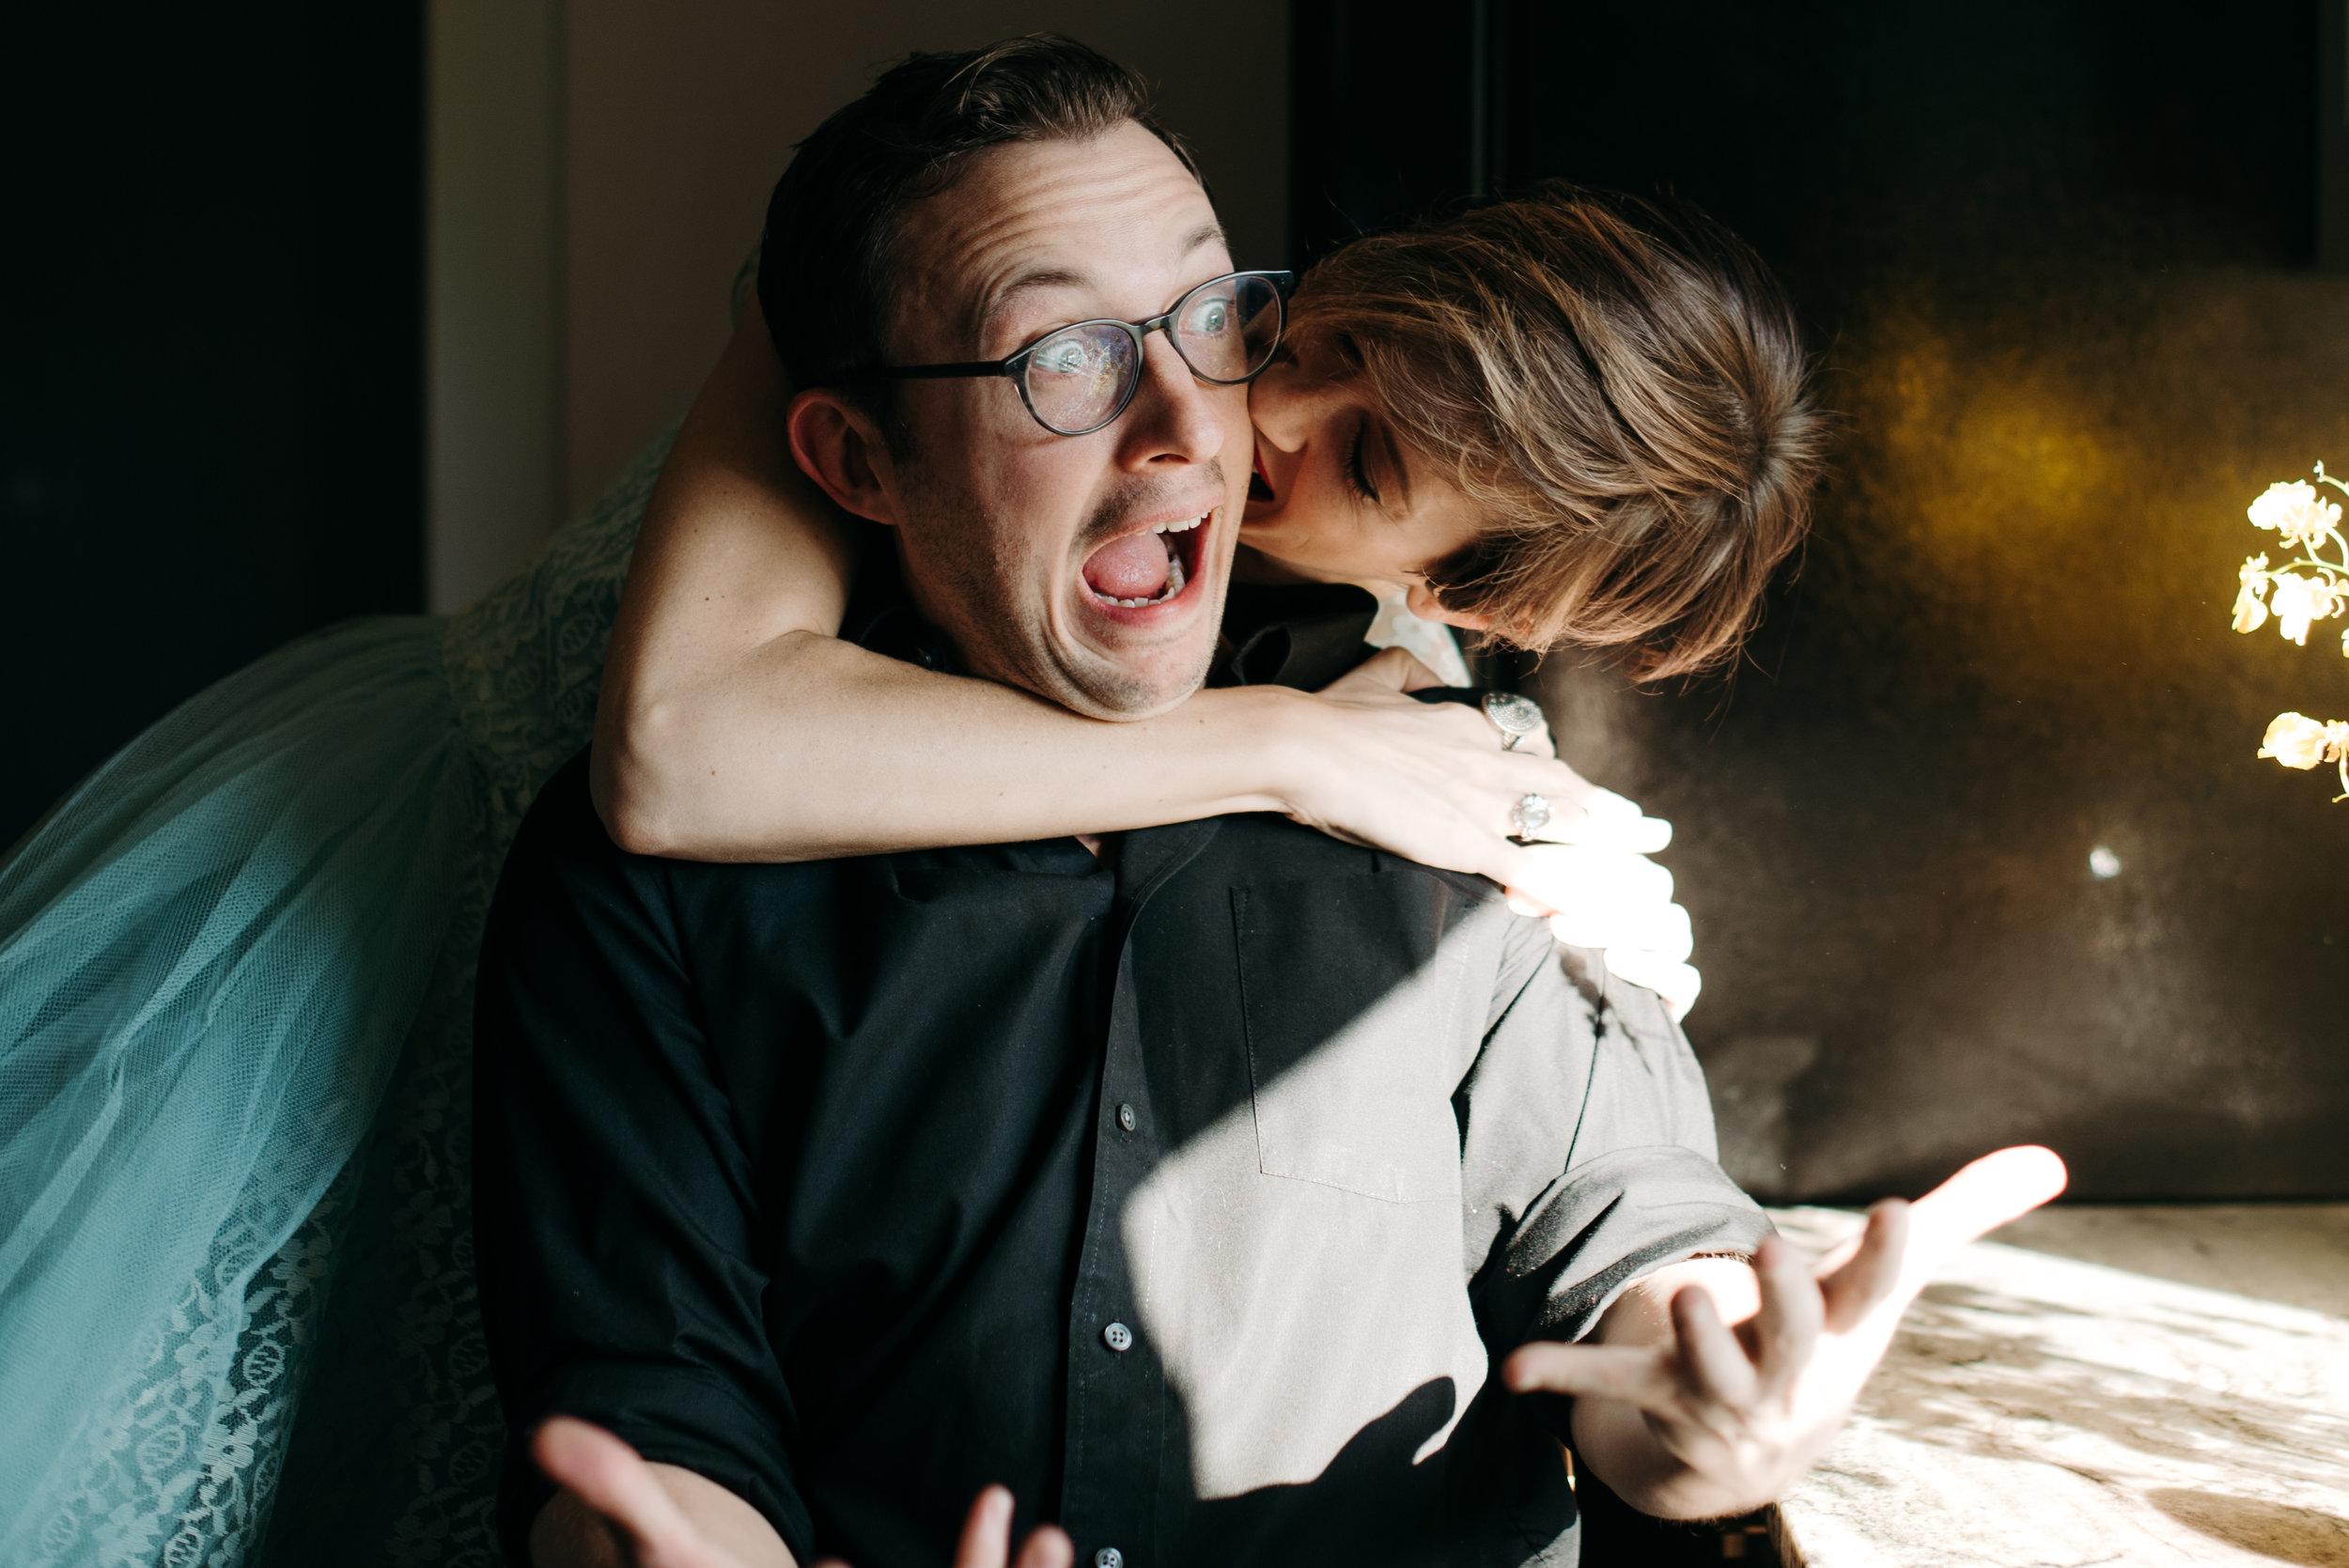 carissa-spencer-mid-century-editorial-in-home-couple-session-orlando-florida-189.jpg